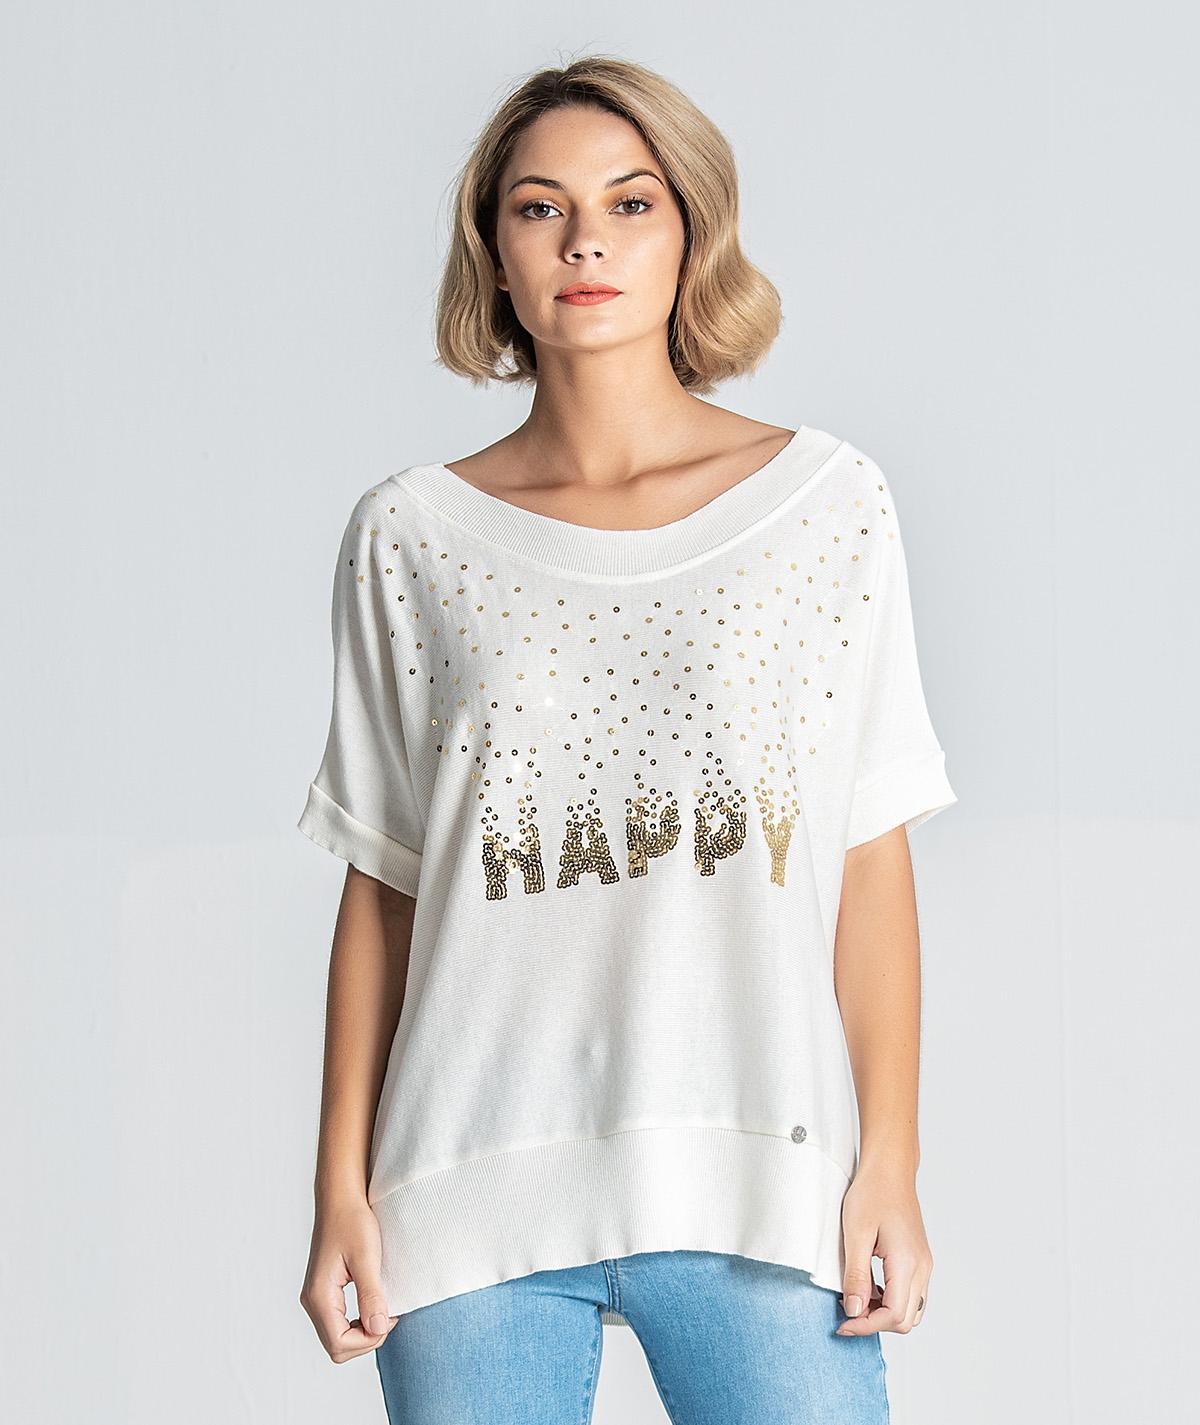 T-Shirt - Ruga